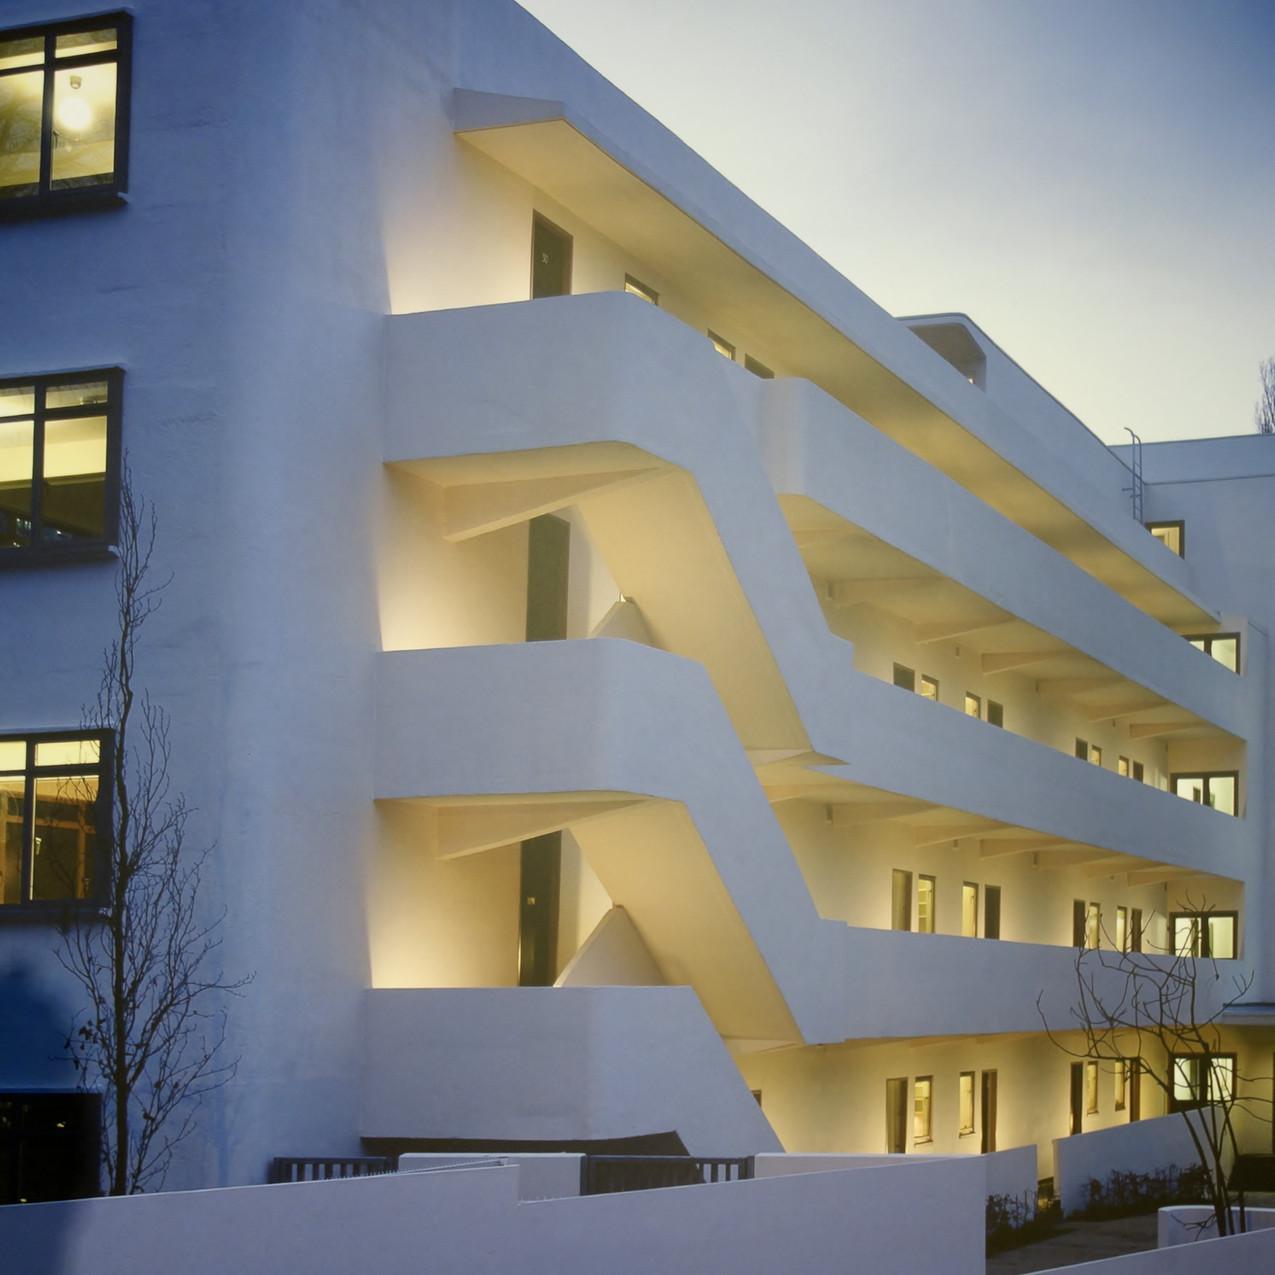 Isokon and the Bauhaus